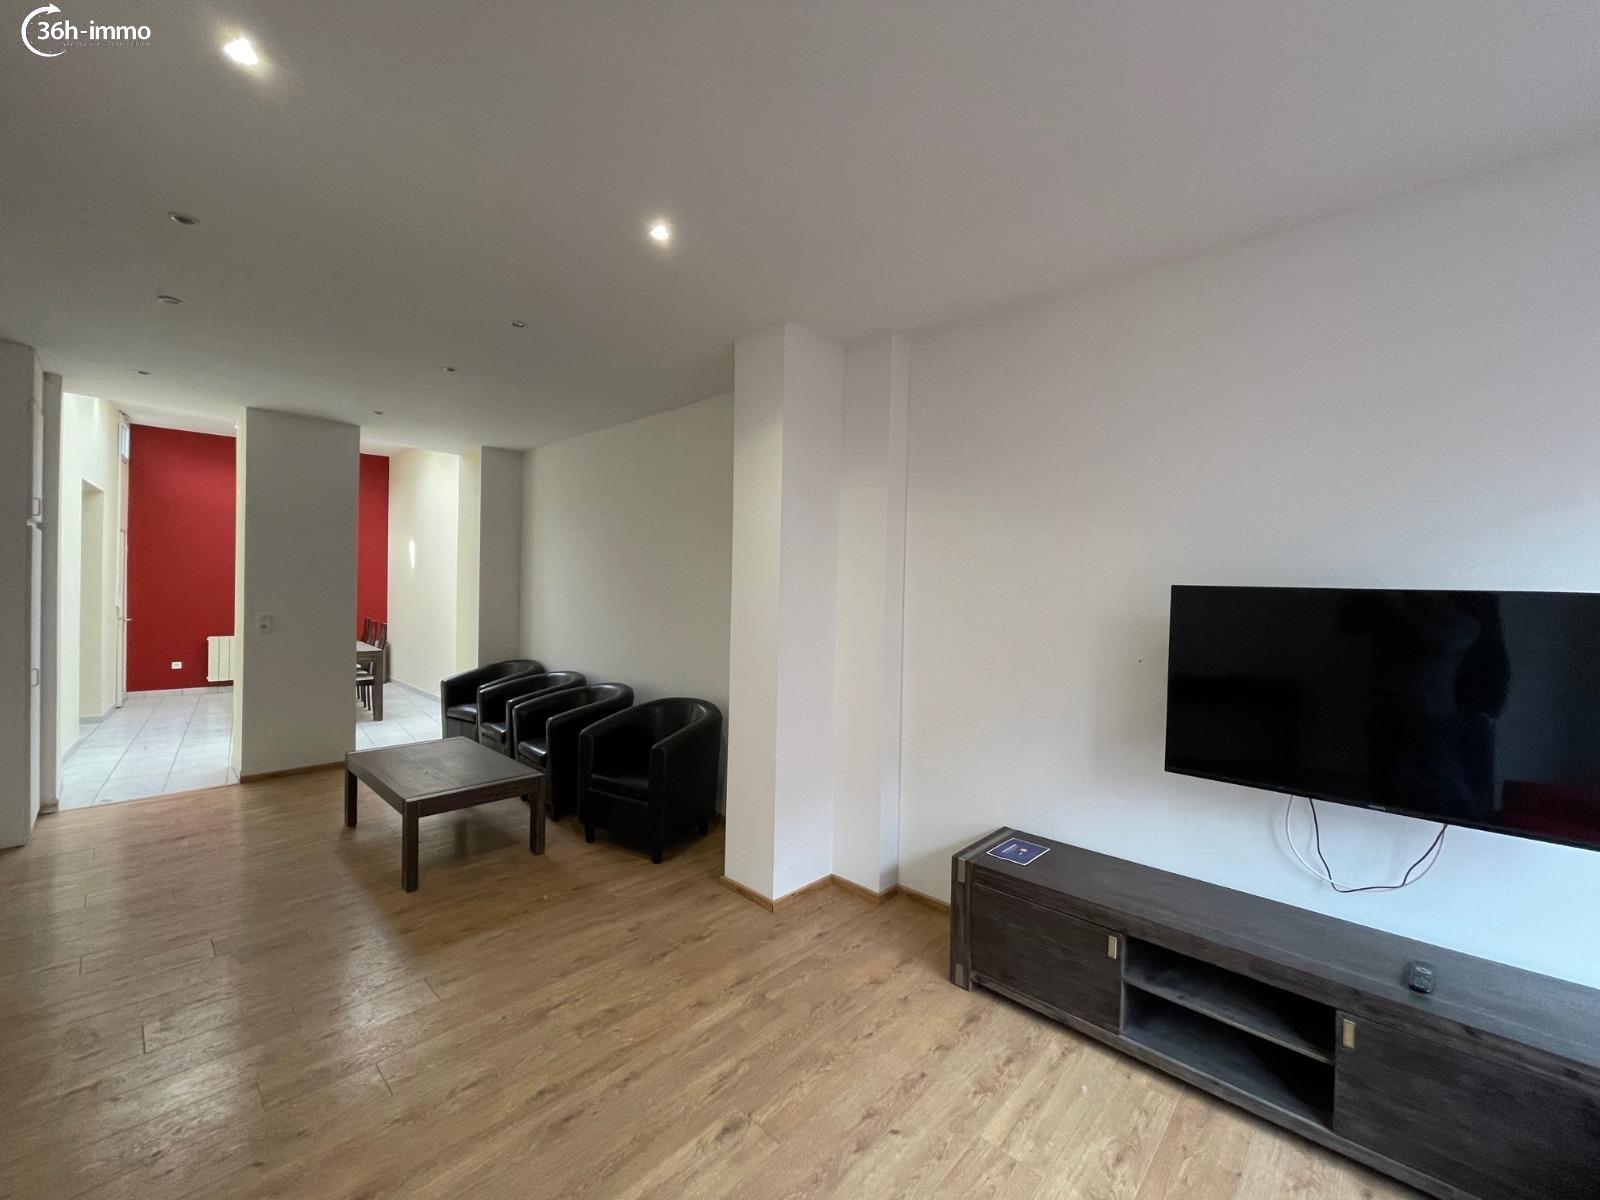 Immeuble Tourcoing 59200 Nord 127 m<sup>2</sup> 212000 euros